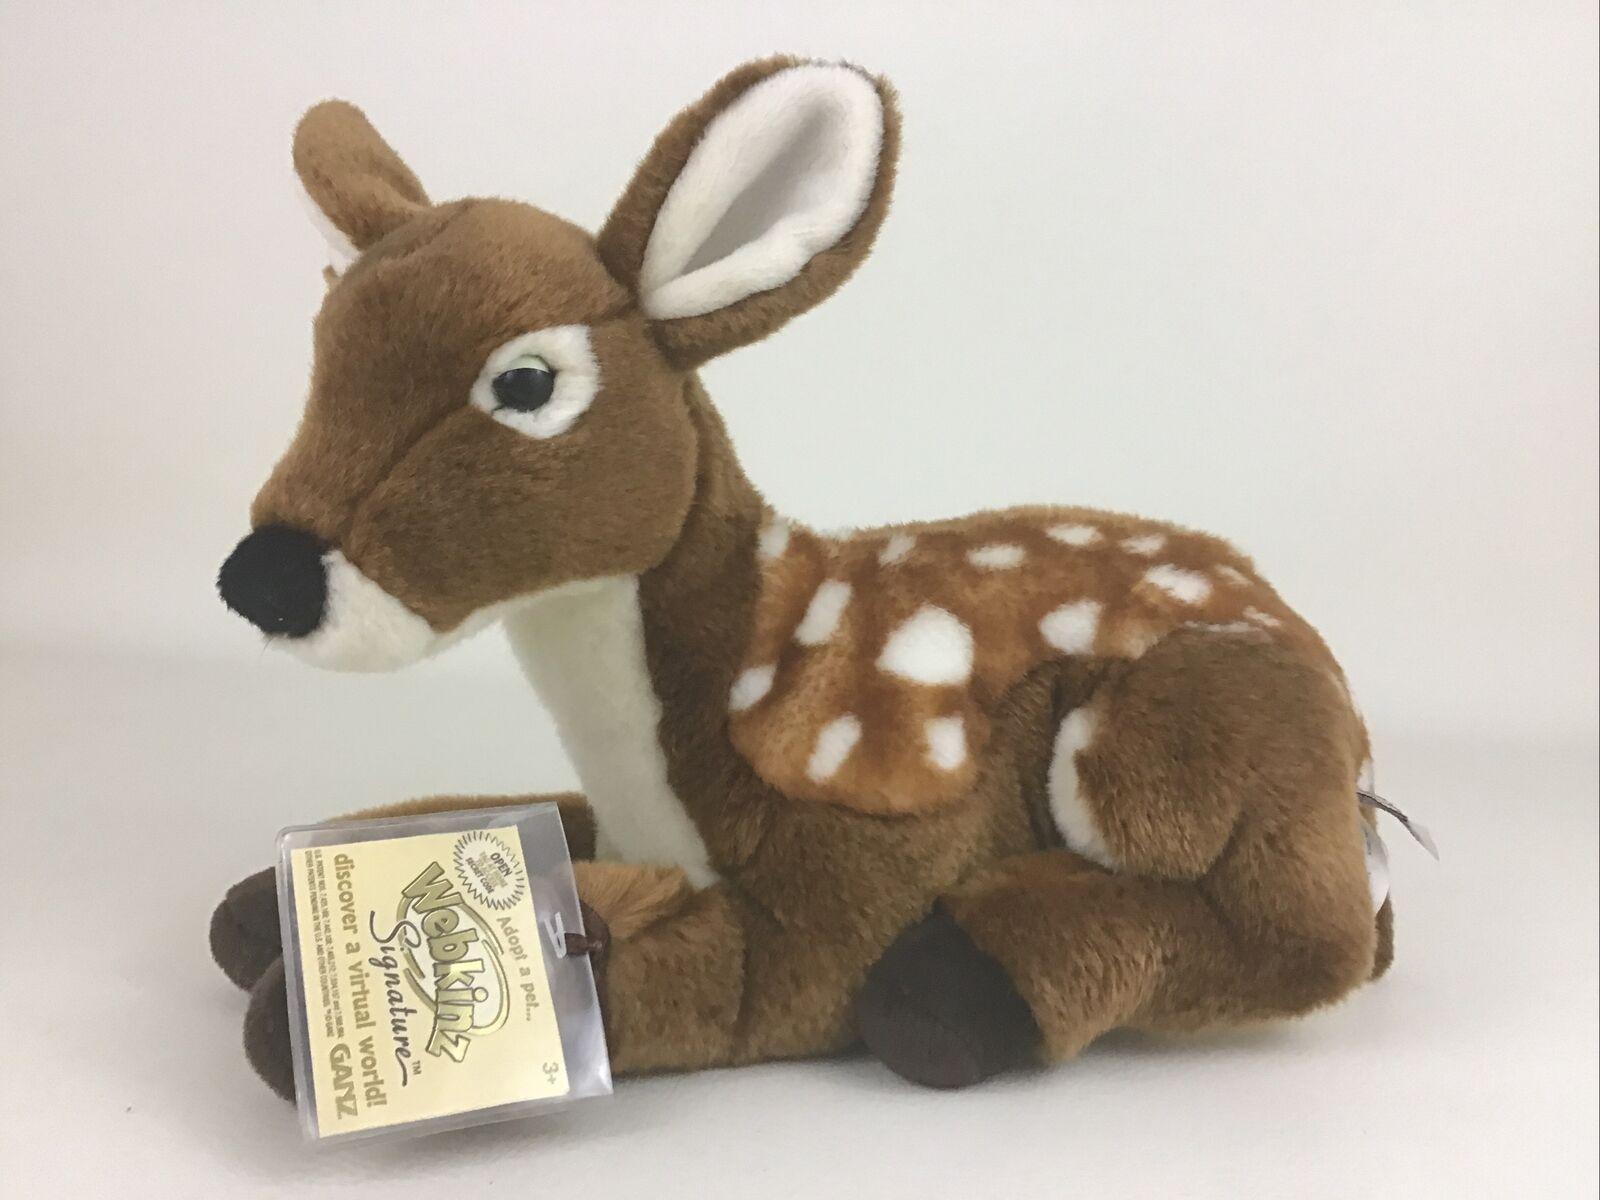 Webkinz Signature Sleepy Baby Fawn Deer Plush Stuffed Animal Toy Ganz with CODE - $39.55